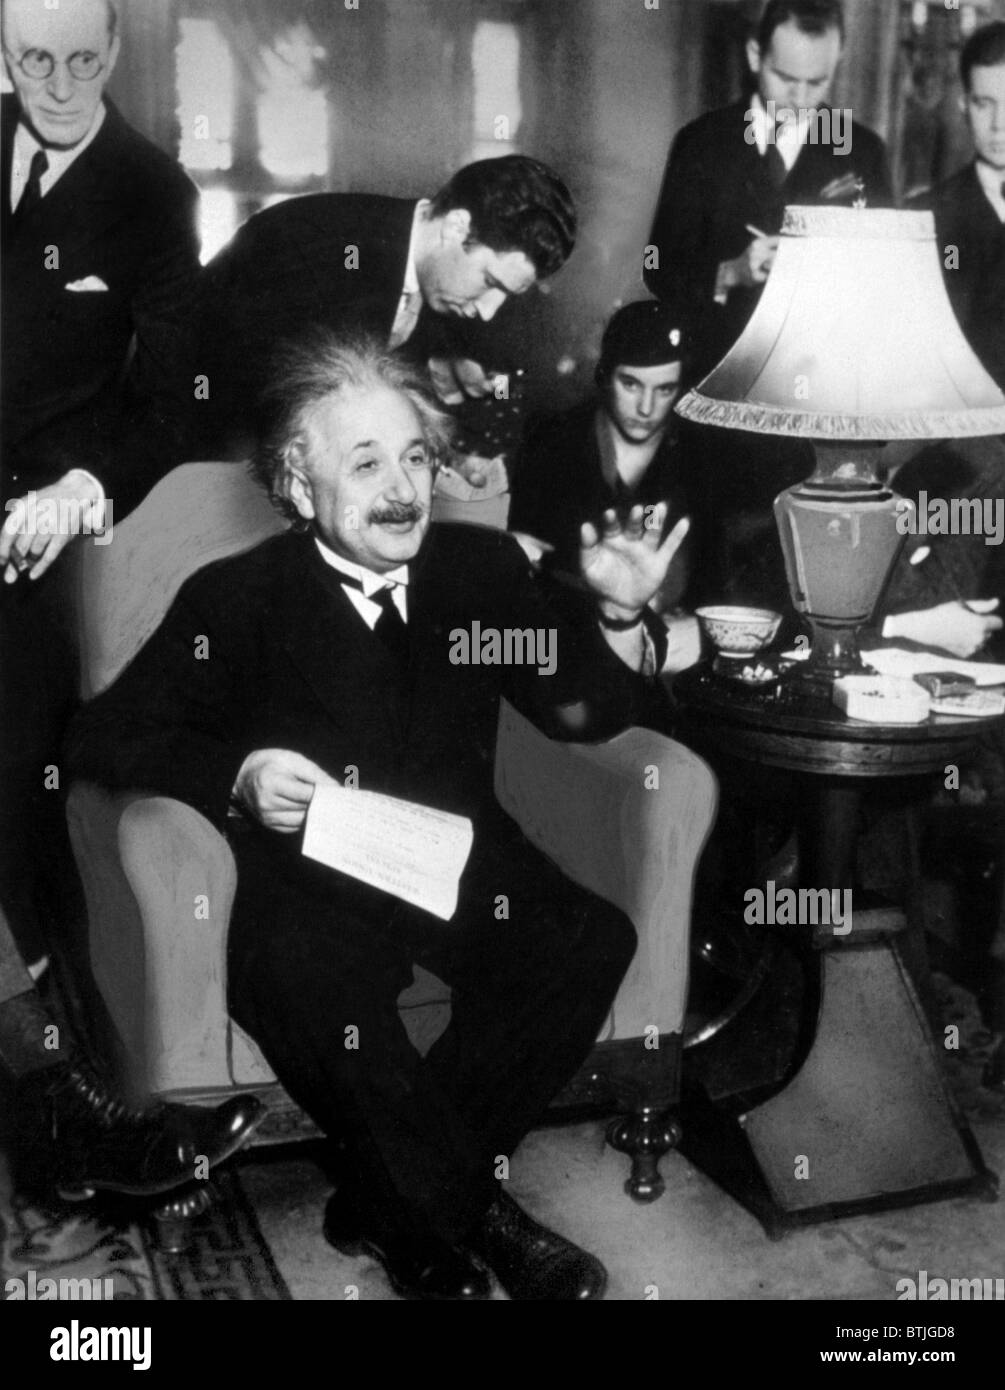 ALBERT EINSTEIN, 1934 Stock Photo